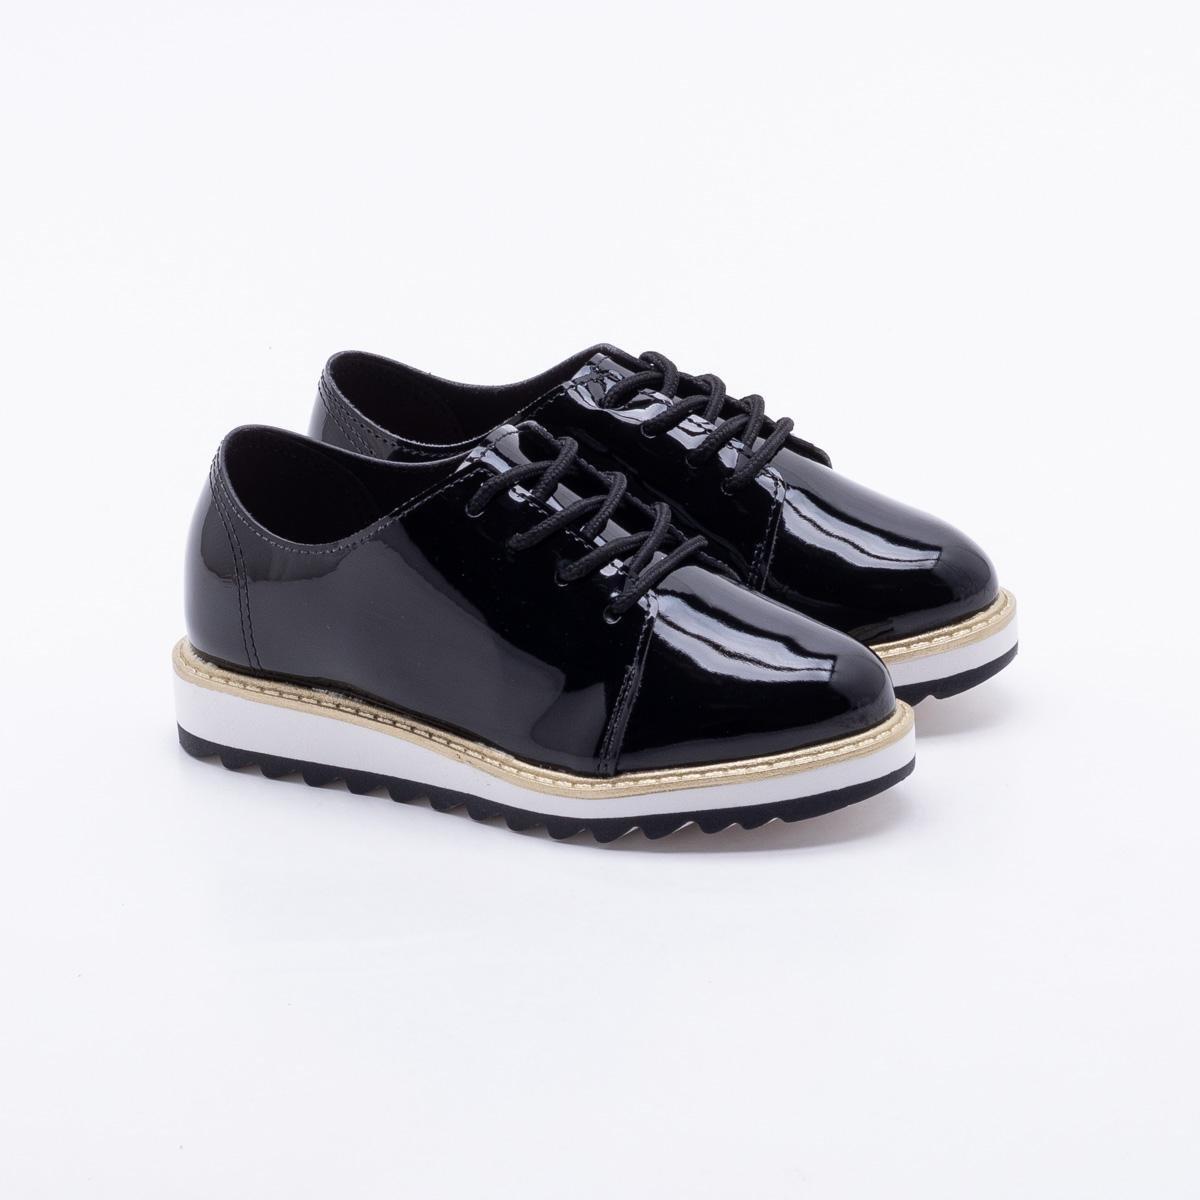 bdb010512 Sapato infantil oxford molekinha verniz feminino compre agora jpg 544x544  Sapato infantil oxford molekinha verniz preto